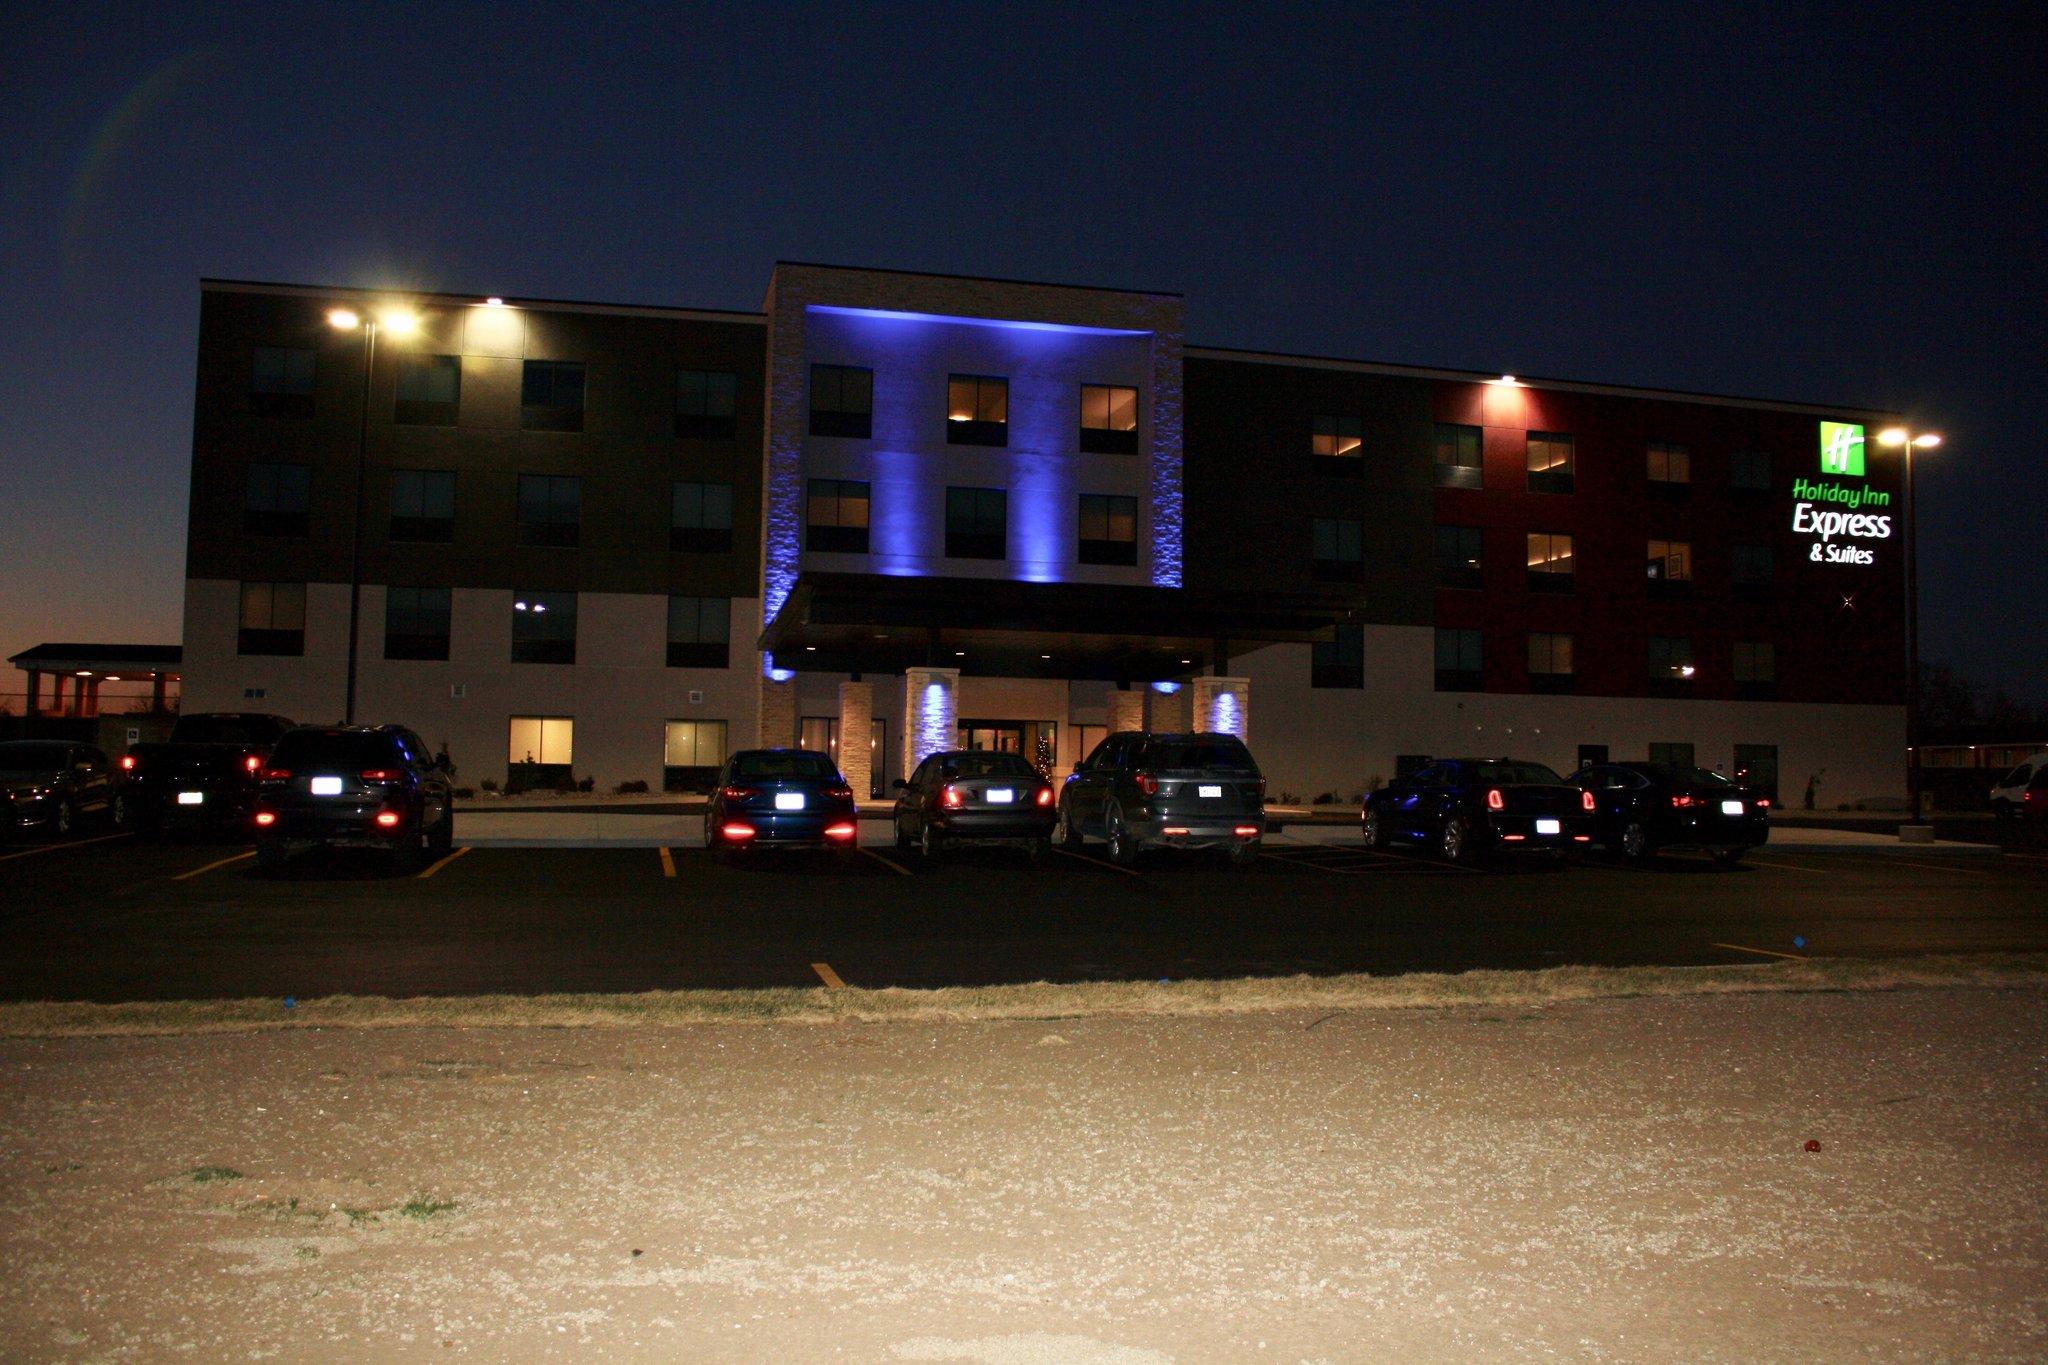 Holiday Inn Express Stes University Area